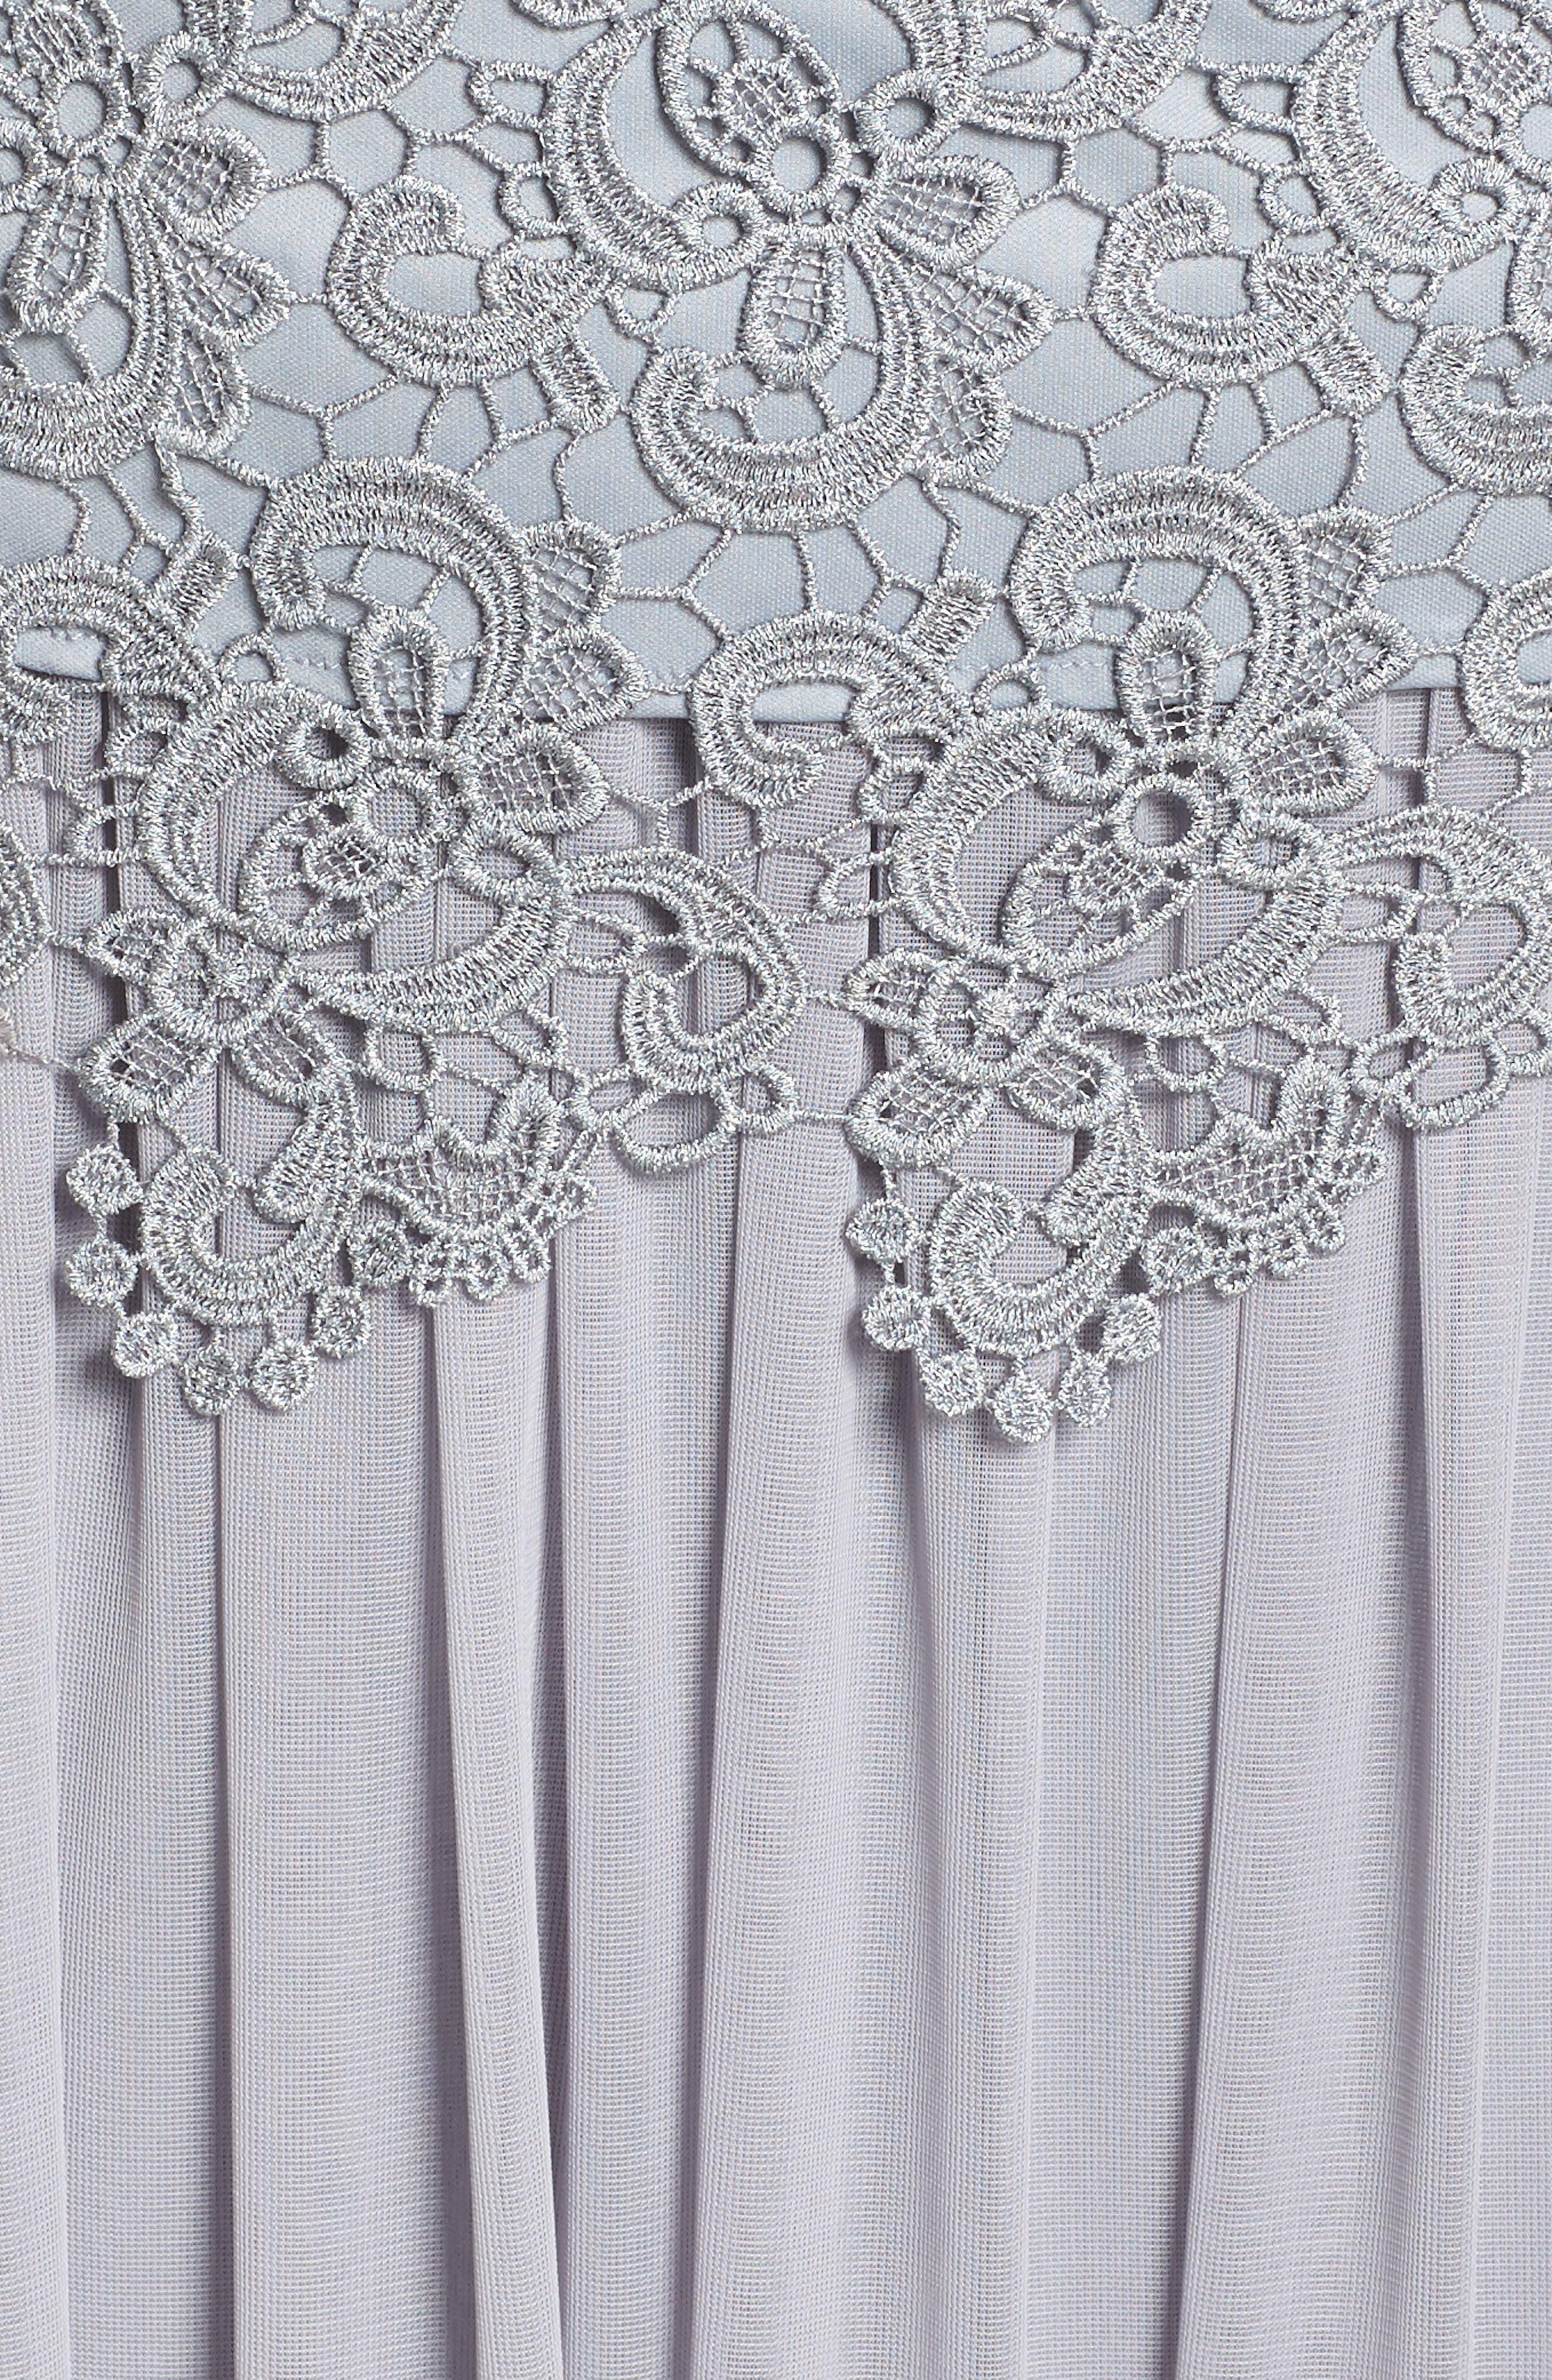 Lace & Chiffon Tea Length Dress,                             Alternate thumbnail 5, color,                             Silver